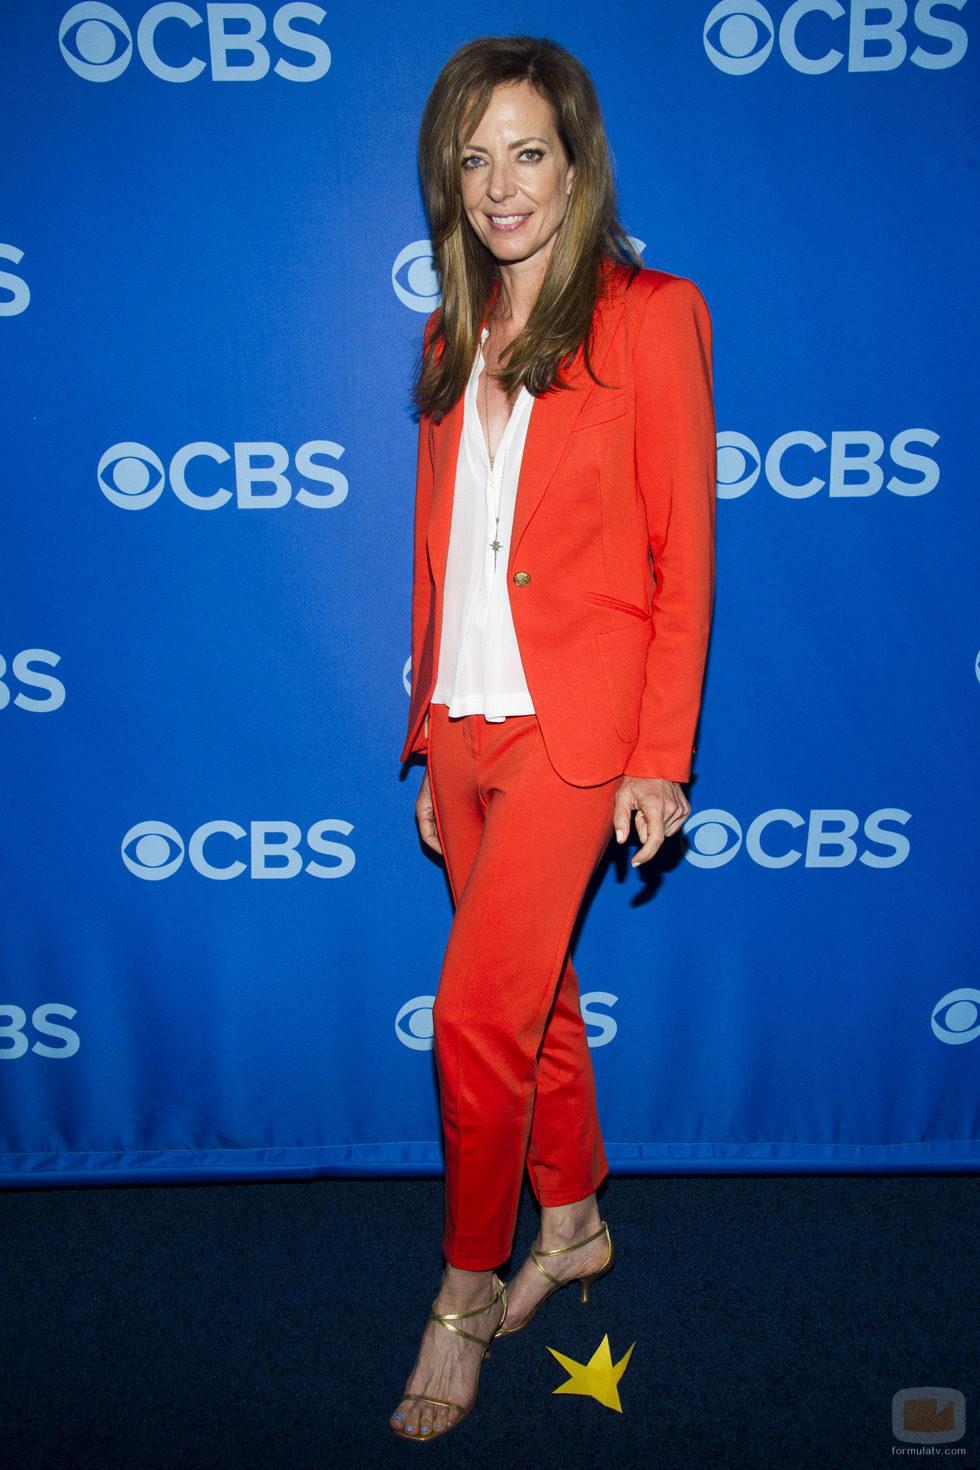 Allison Janney ('Mom') en los Upfronts 2013 de CBS